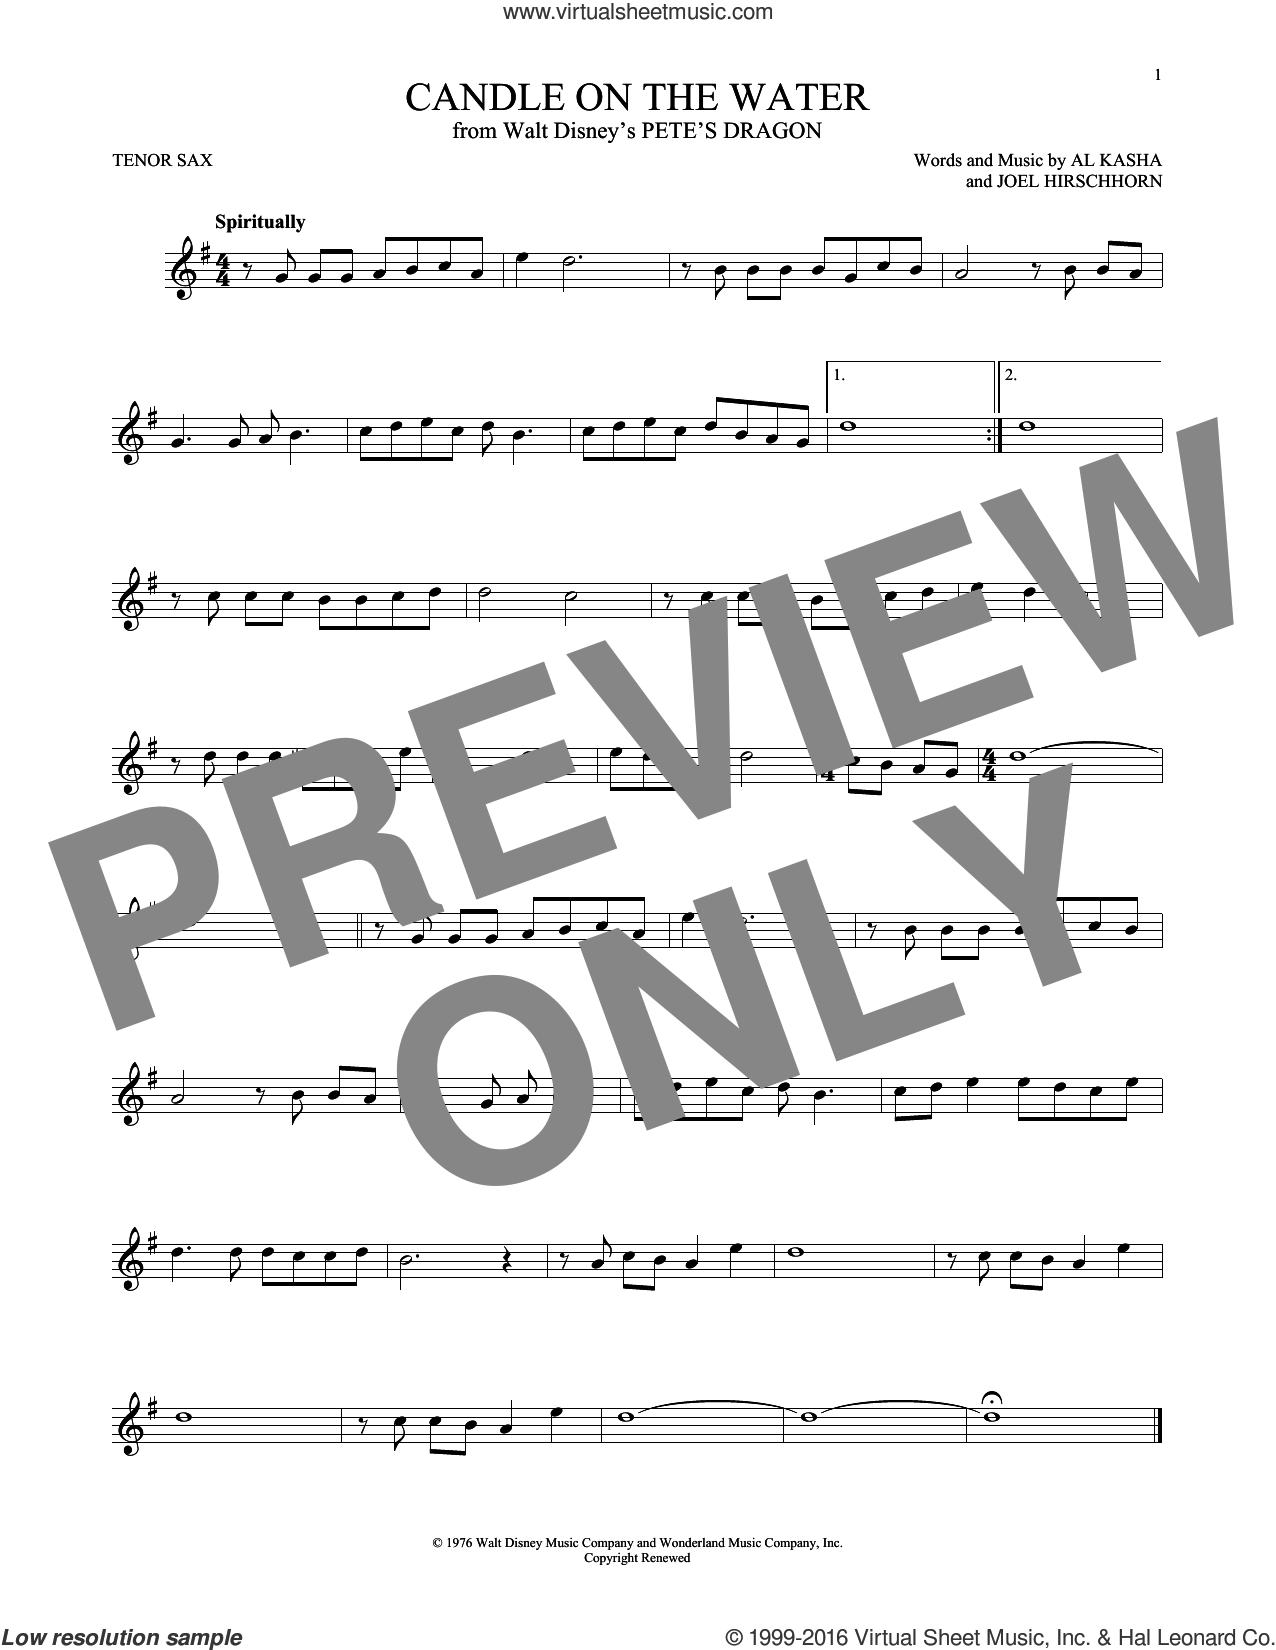 Candle On The Water sheet music for tenor saxophone solo by Al Kasha, Al Kasha & Joel Hirschhorn and Joel Hirschhorn, intermediate skill level